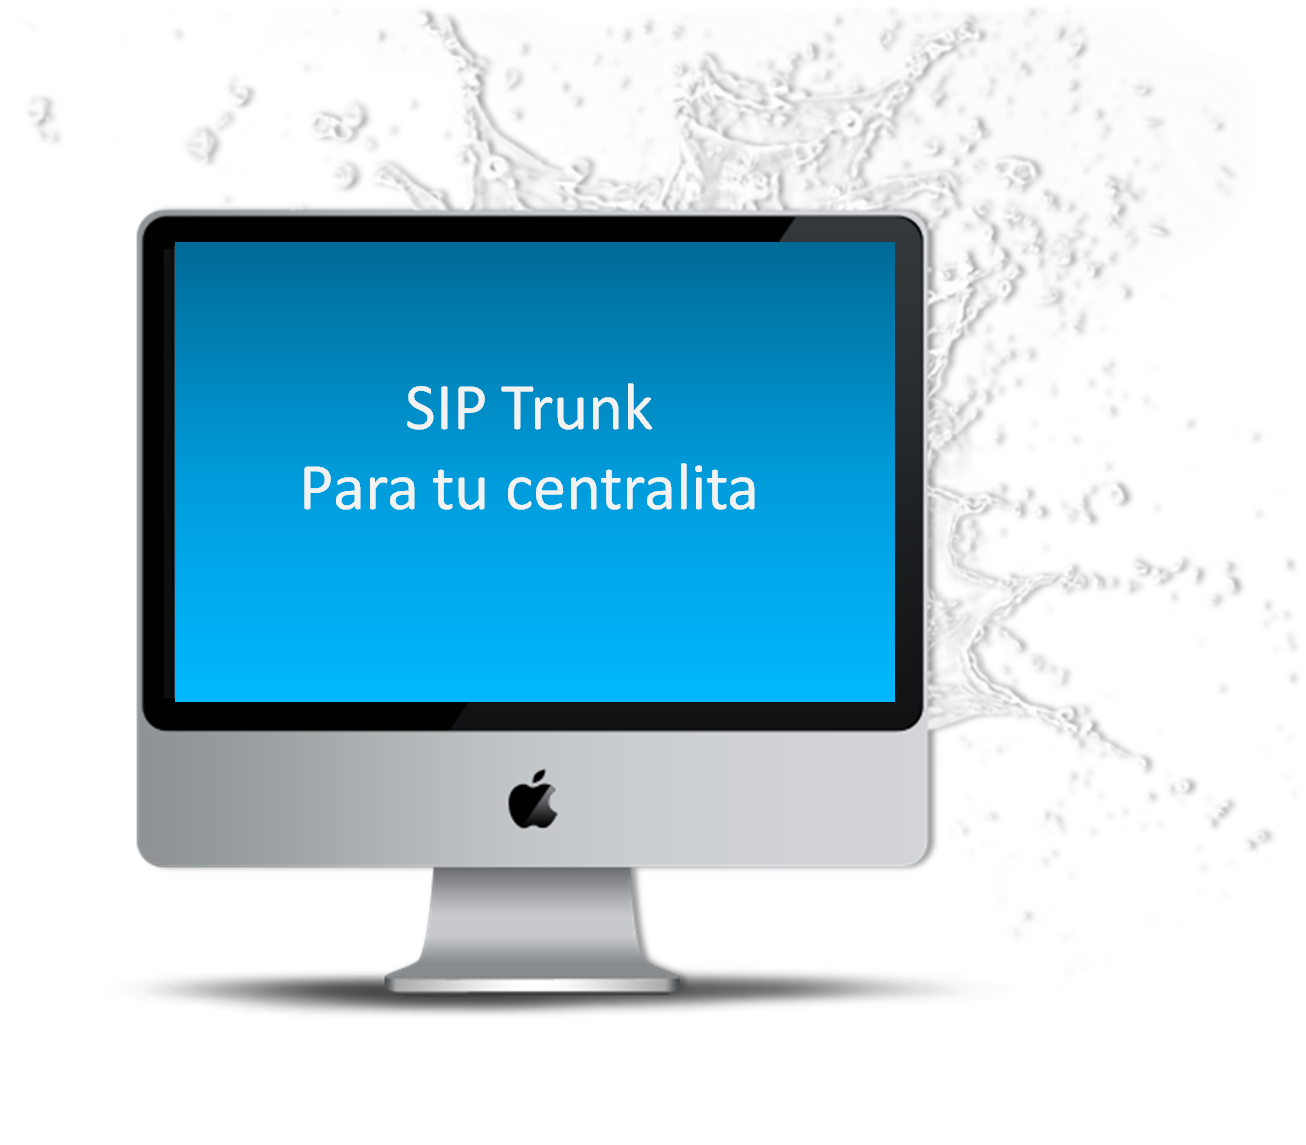 SIP Trunk 0